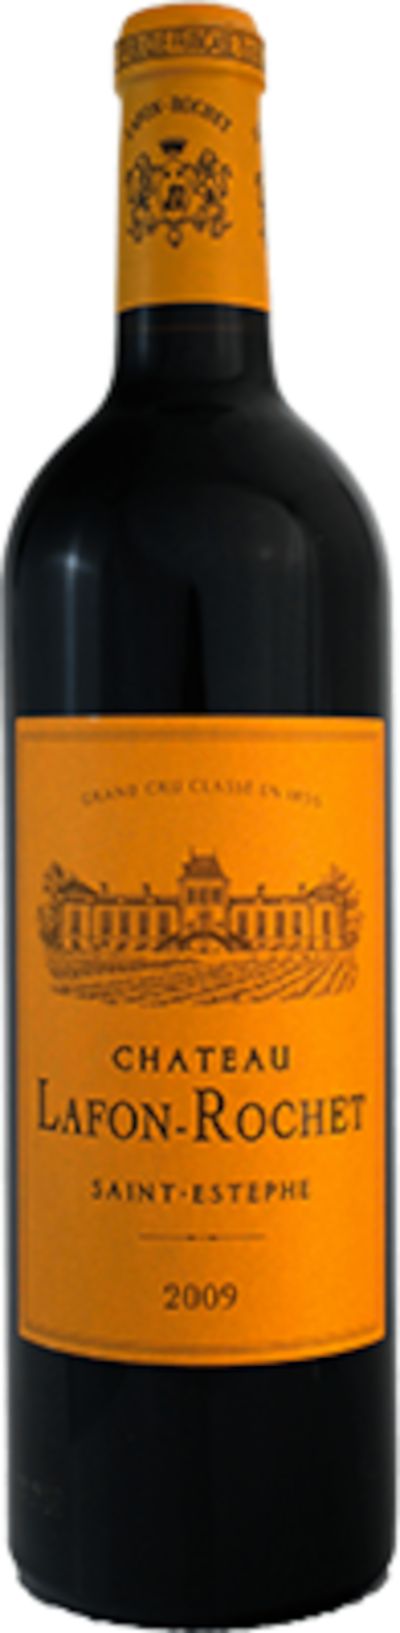 Cháteau Lafon-Rochet - Saint Estèphe Grand Cru Classé